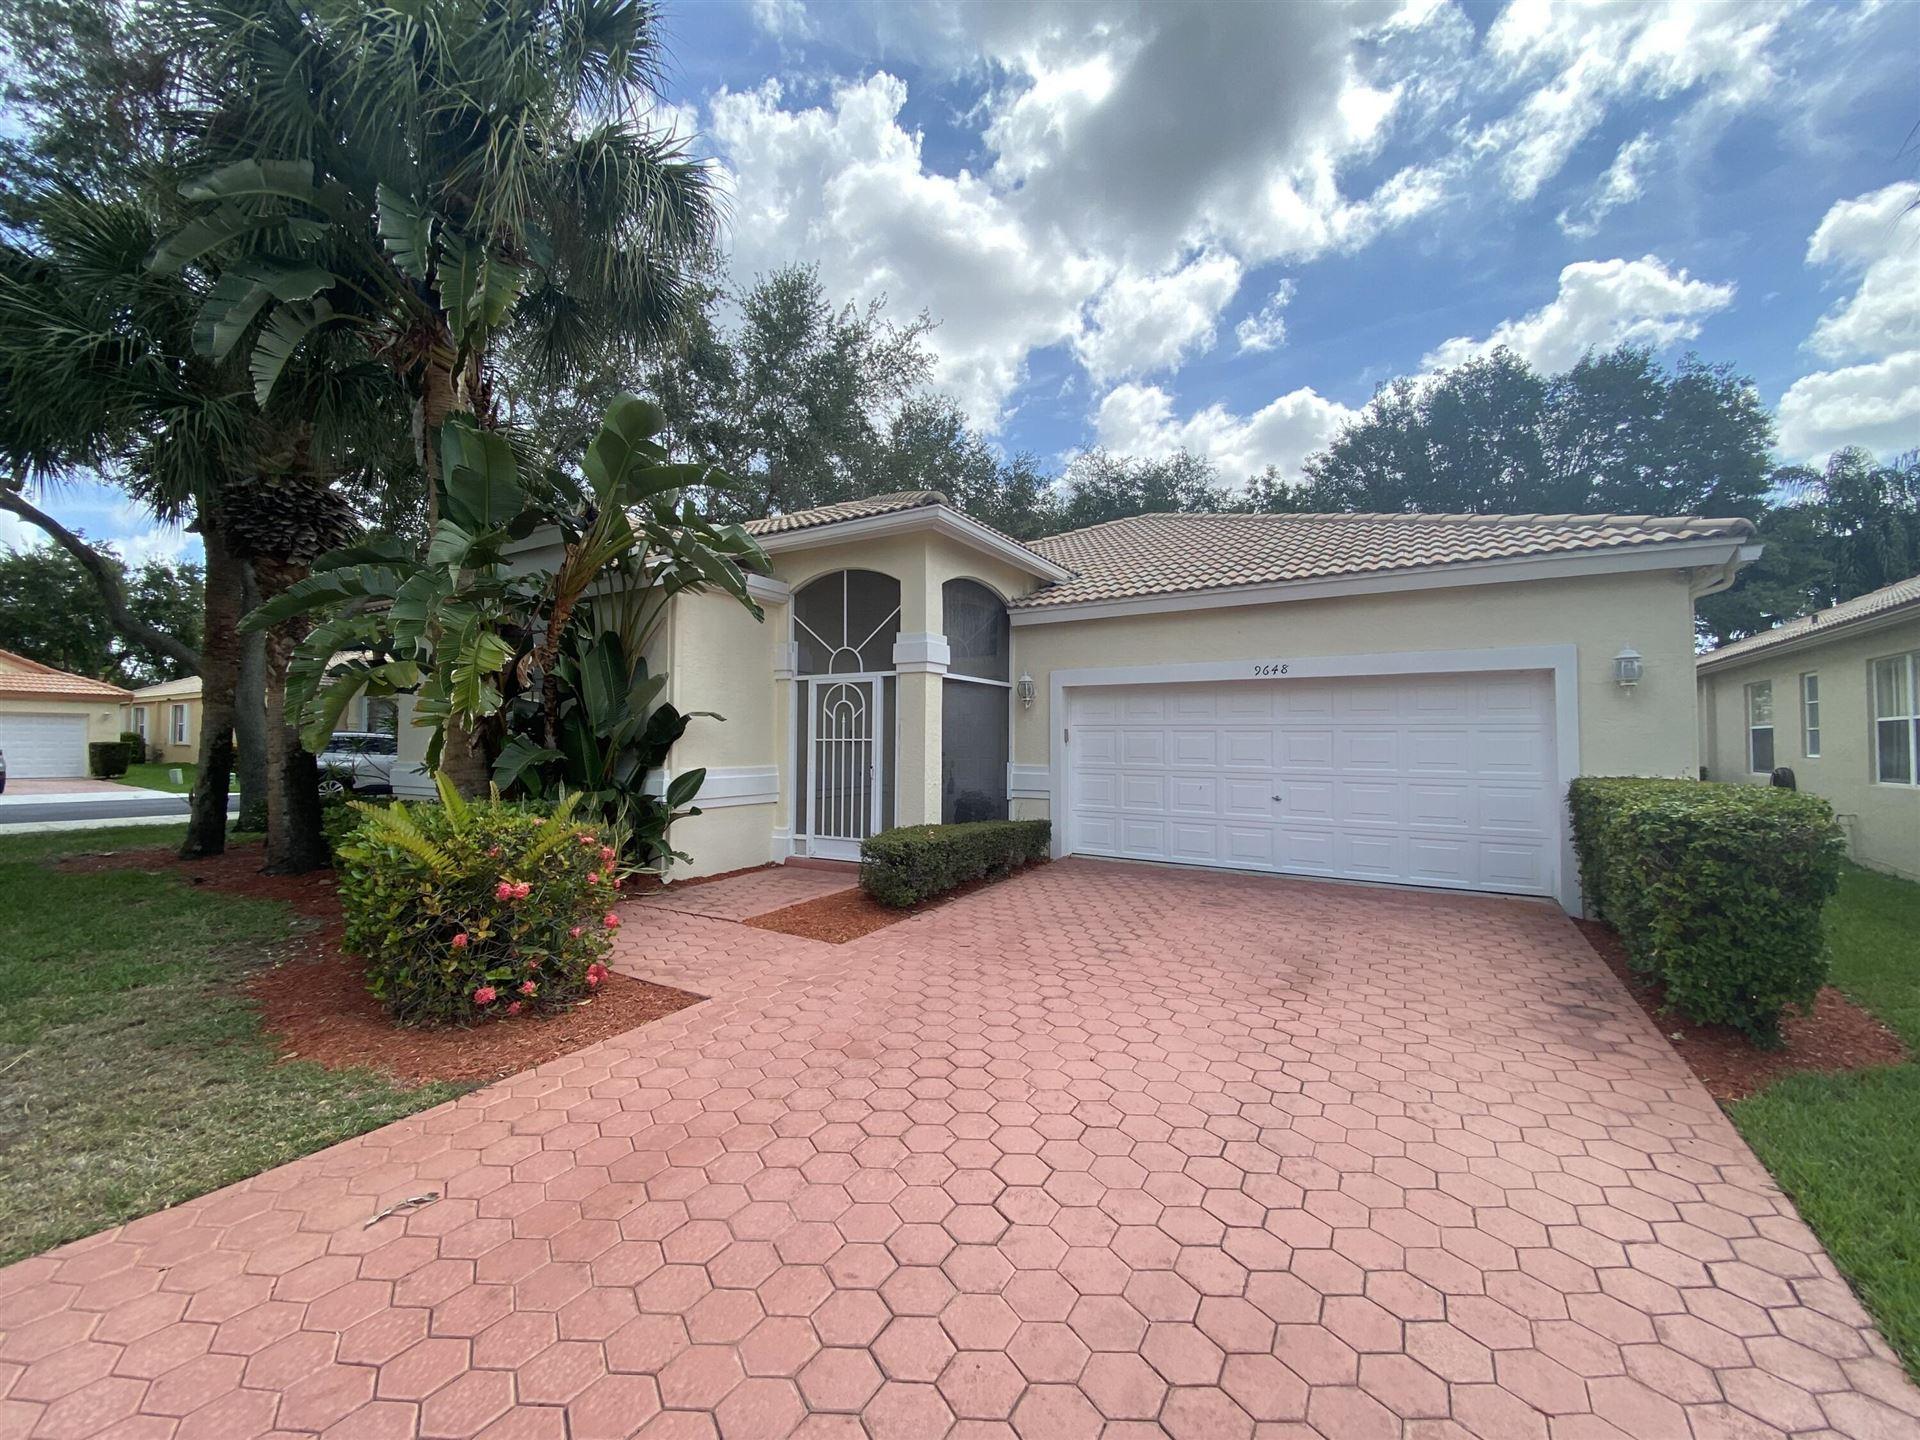 9648 Arbor View Drive N, Boynton Beach, FL 33437 - MLS#: RX-10709398